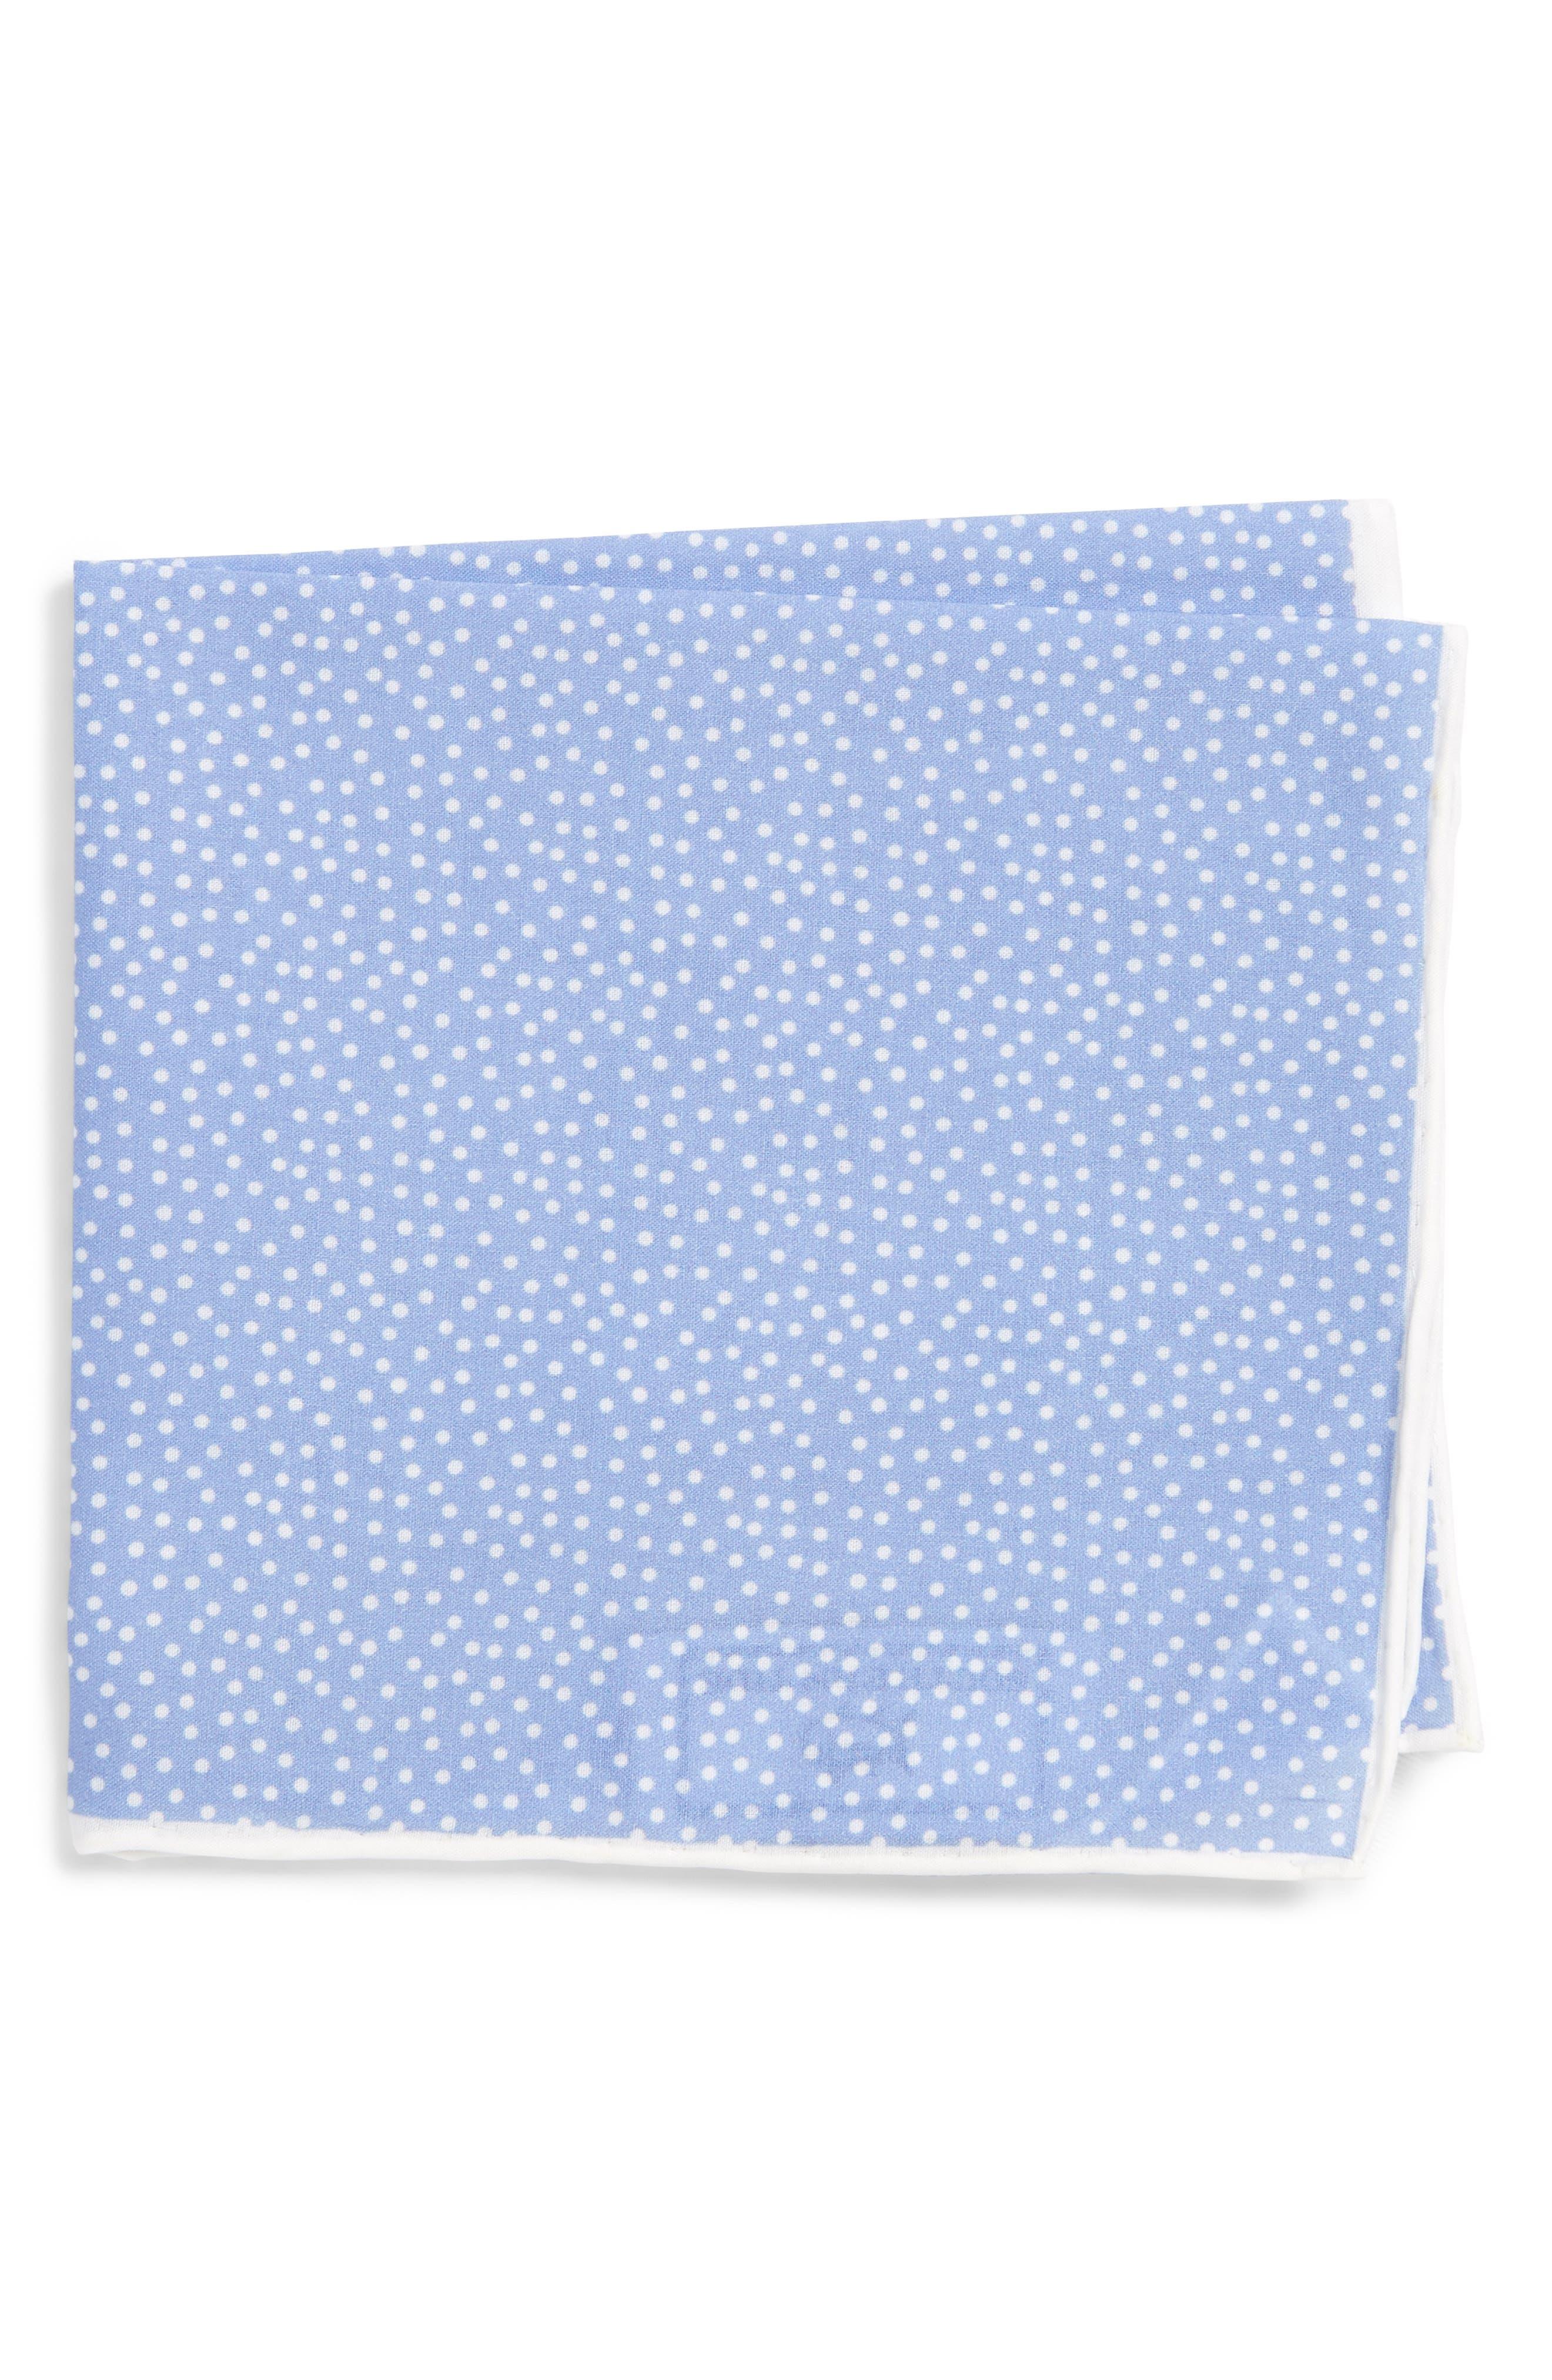 Sagamore Spots Cotton & Silk Pocket Square,                         Main,                         color, Blue